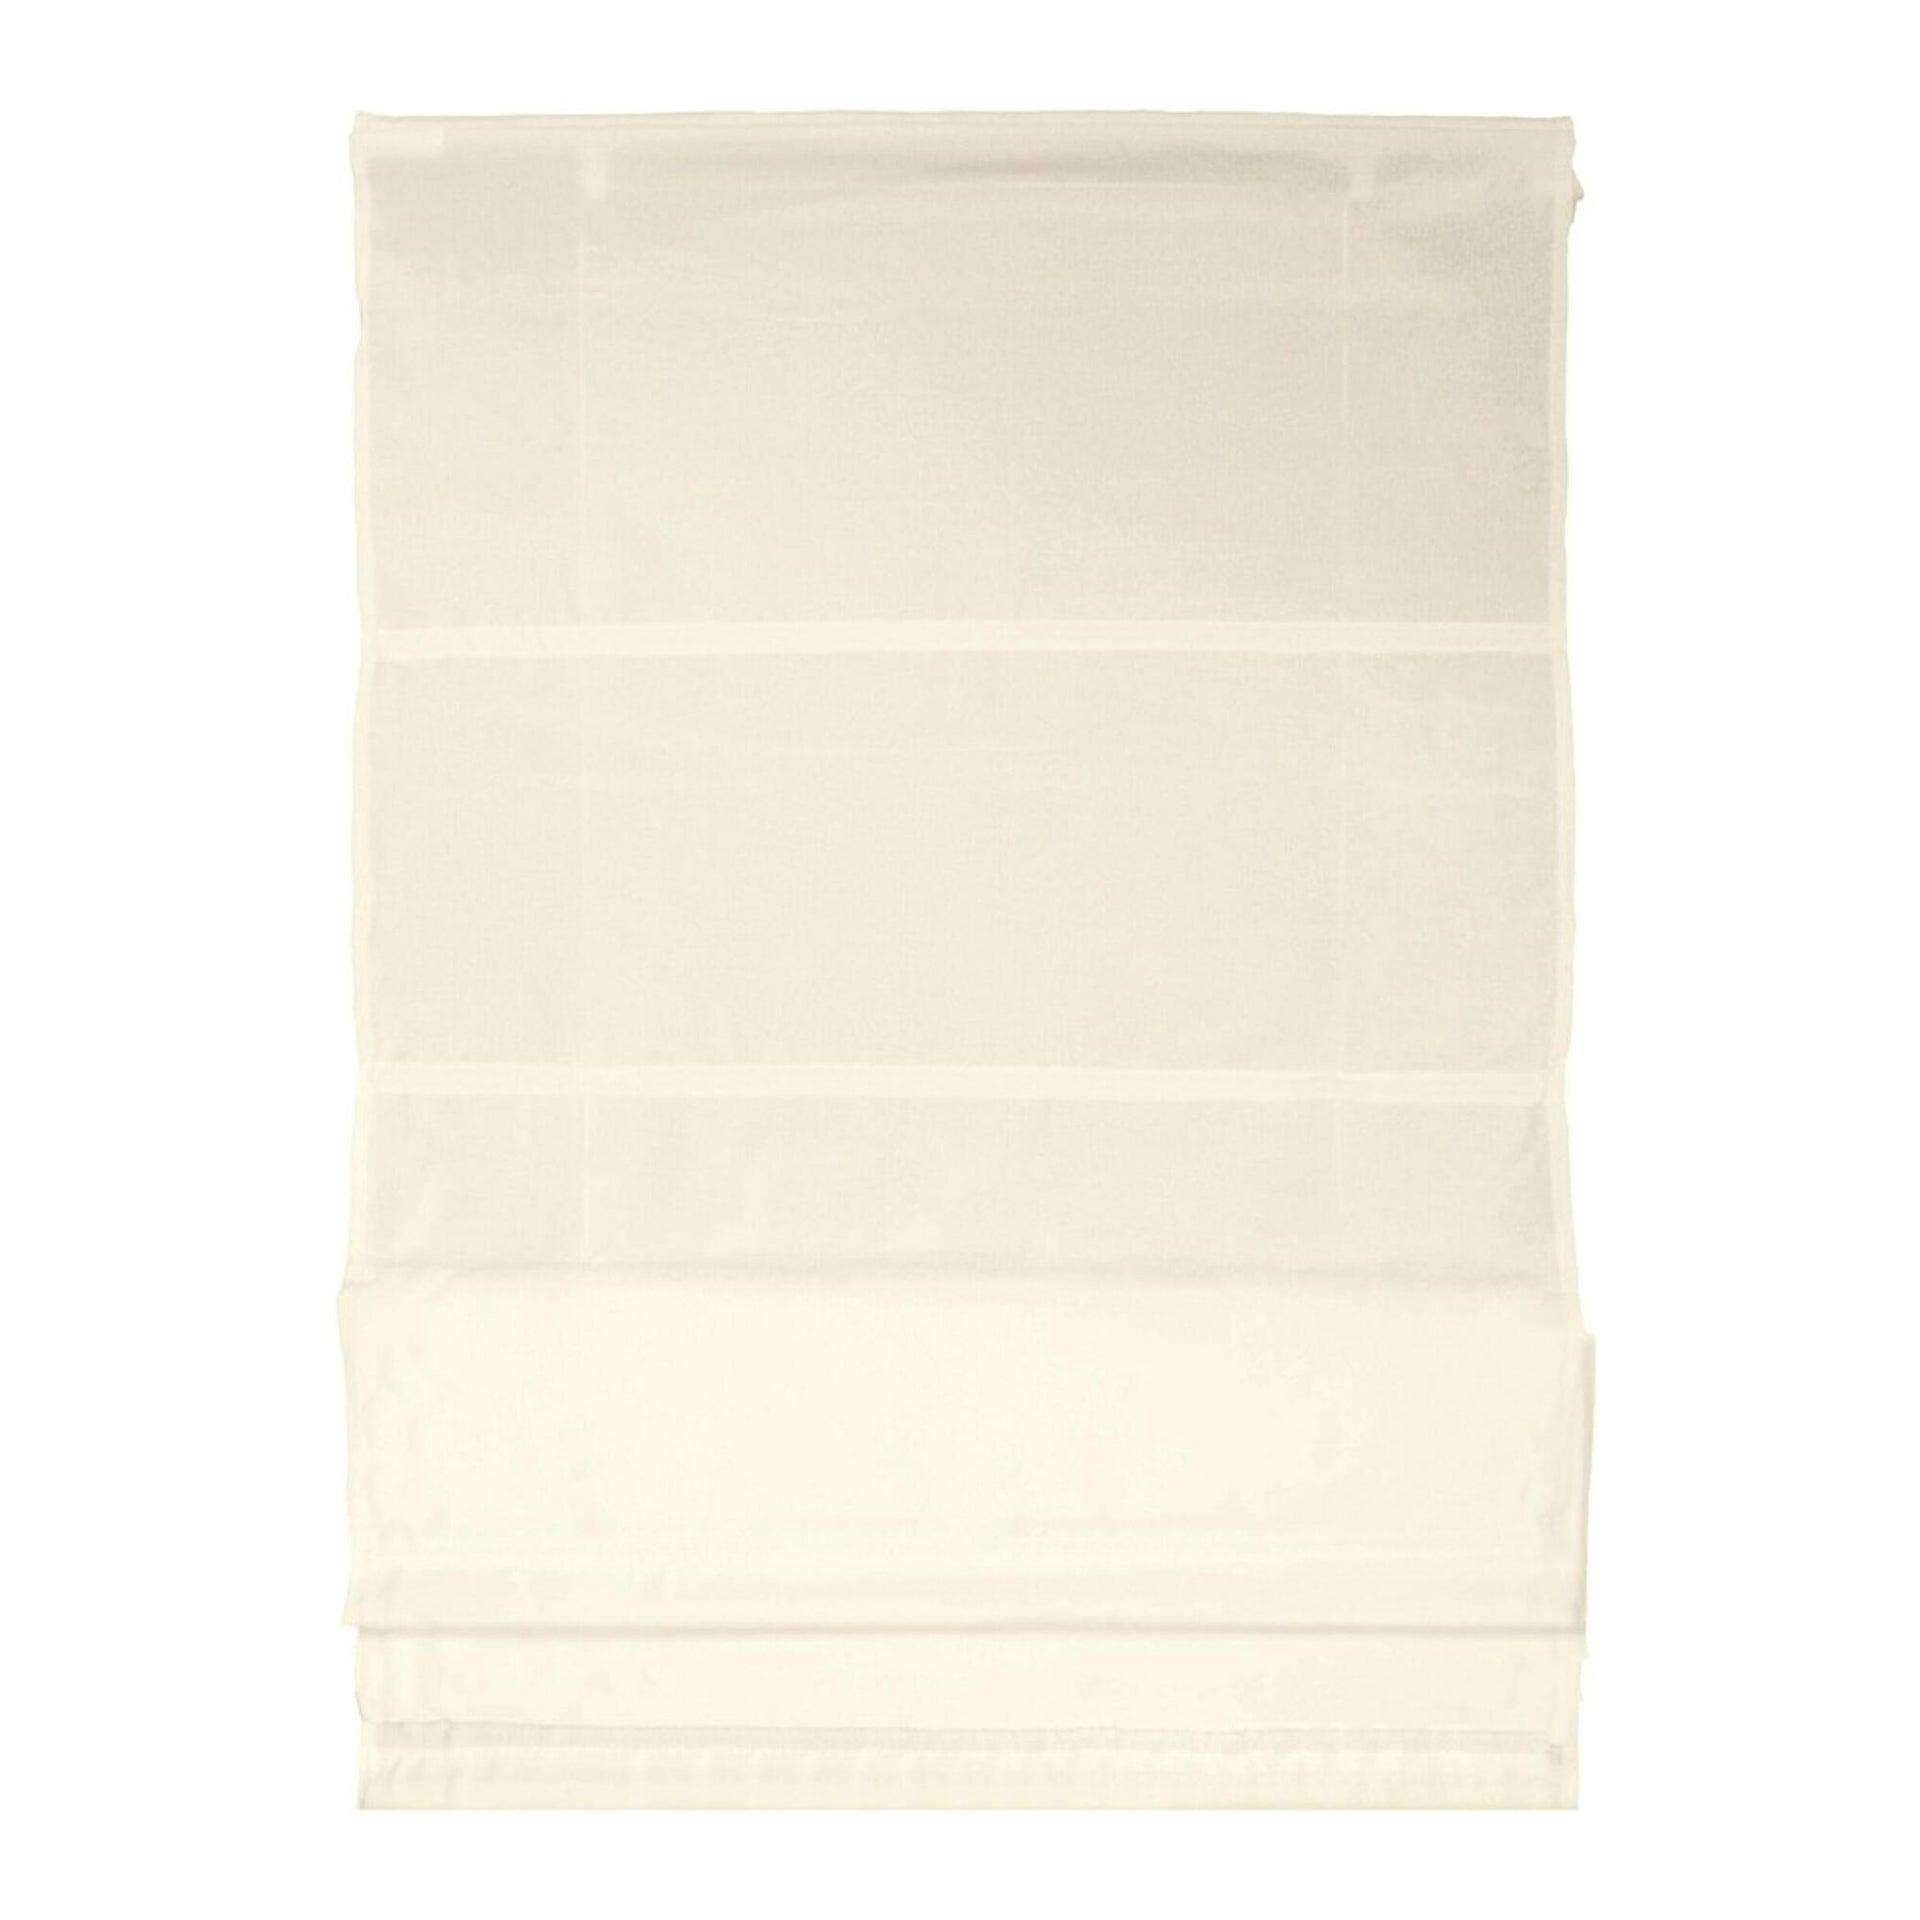 Tenda a pacchetto Maisy bianco 80x150 cm - 2